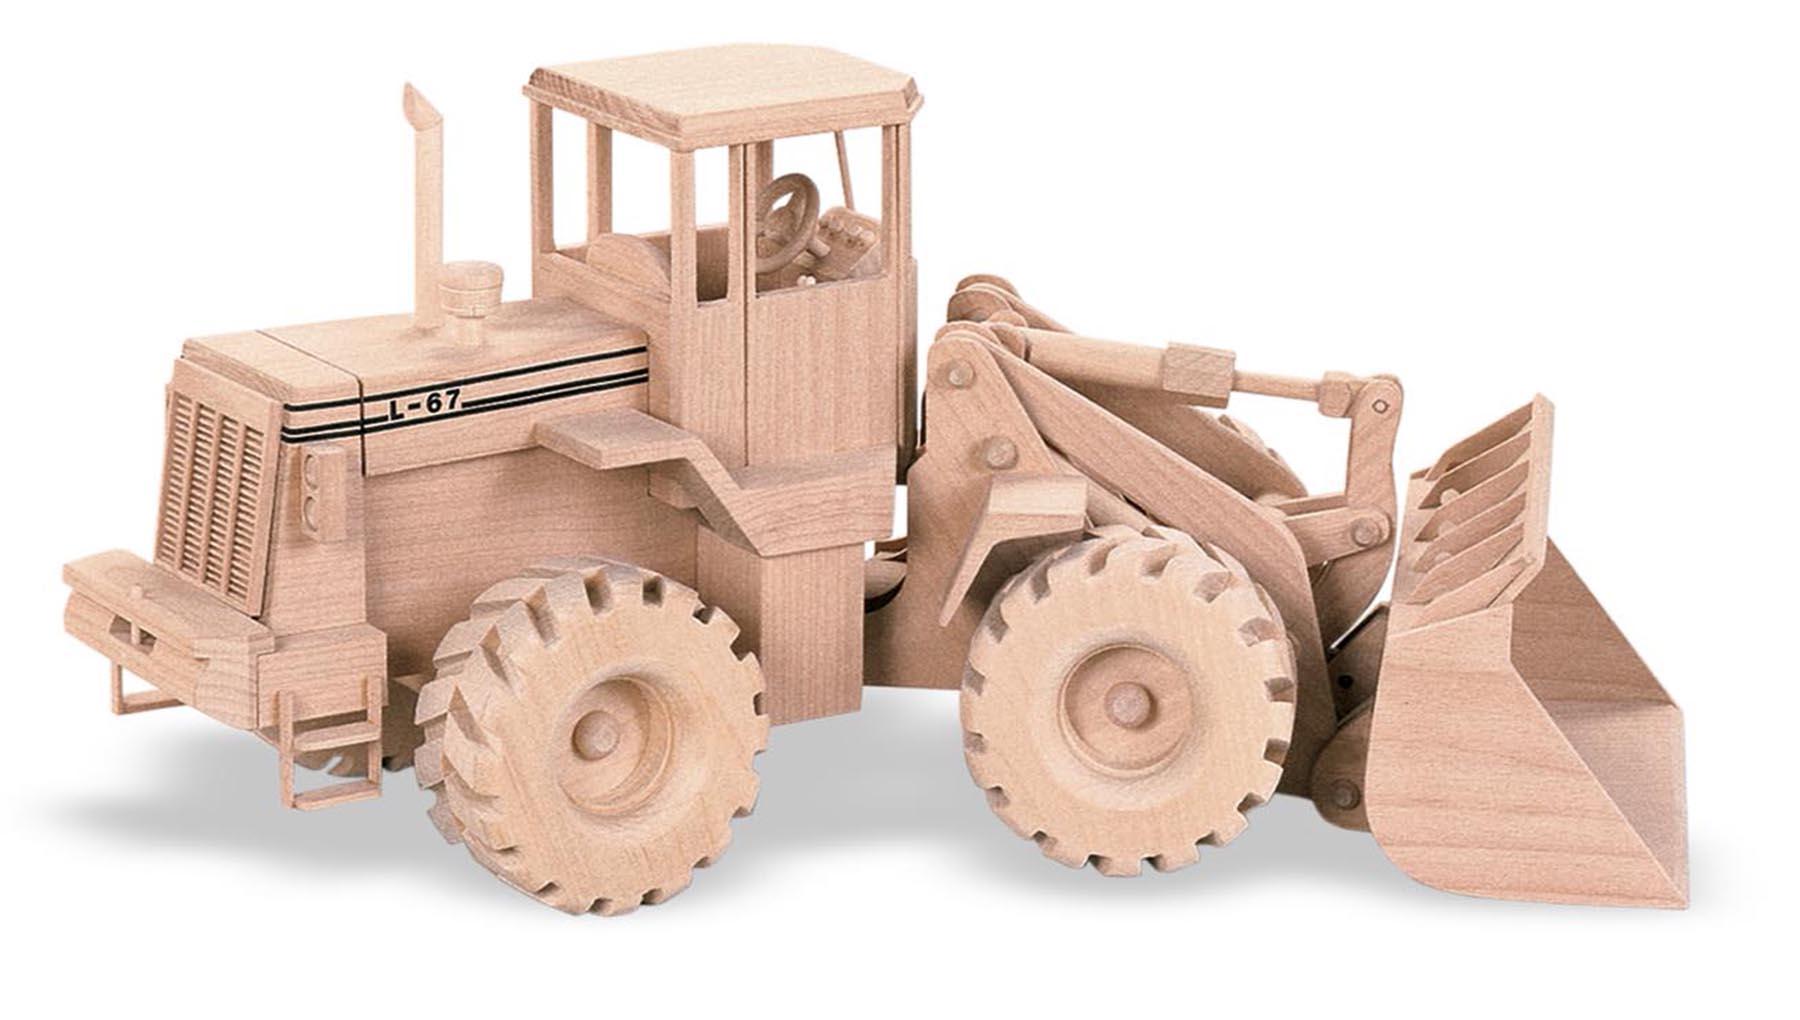 Wooden Toy Trucks Plans Patterns